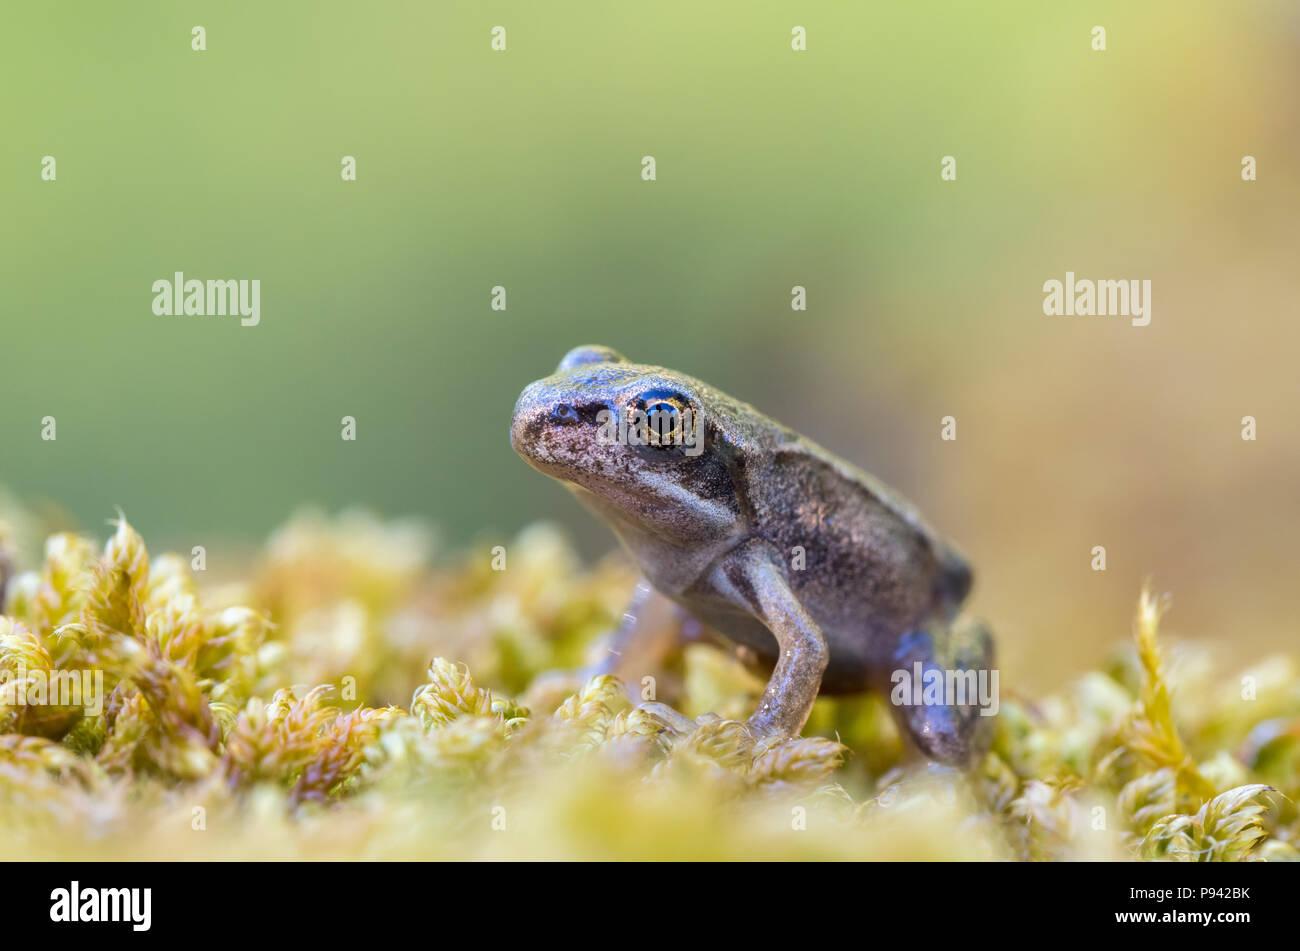 Baby Frog - Stock Image